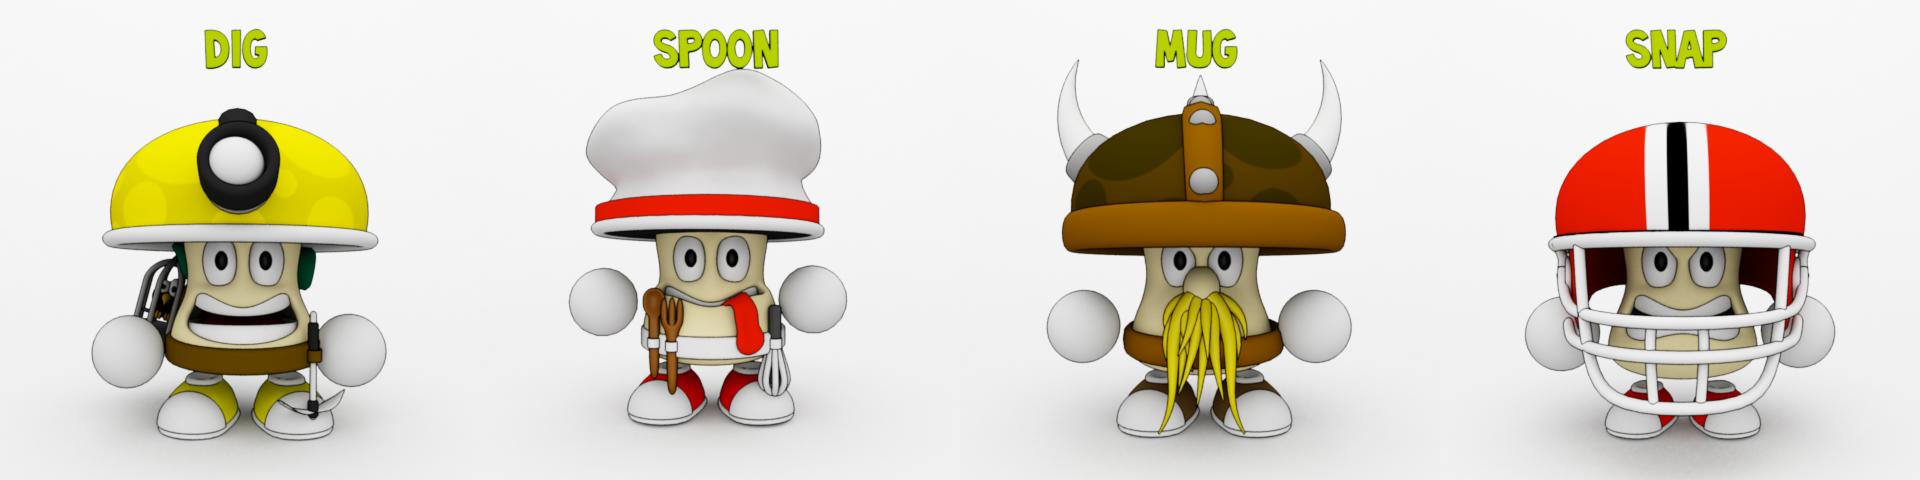 Wacky Spores: The Chase new 3D mushroom